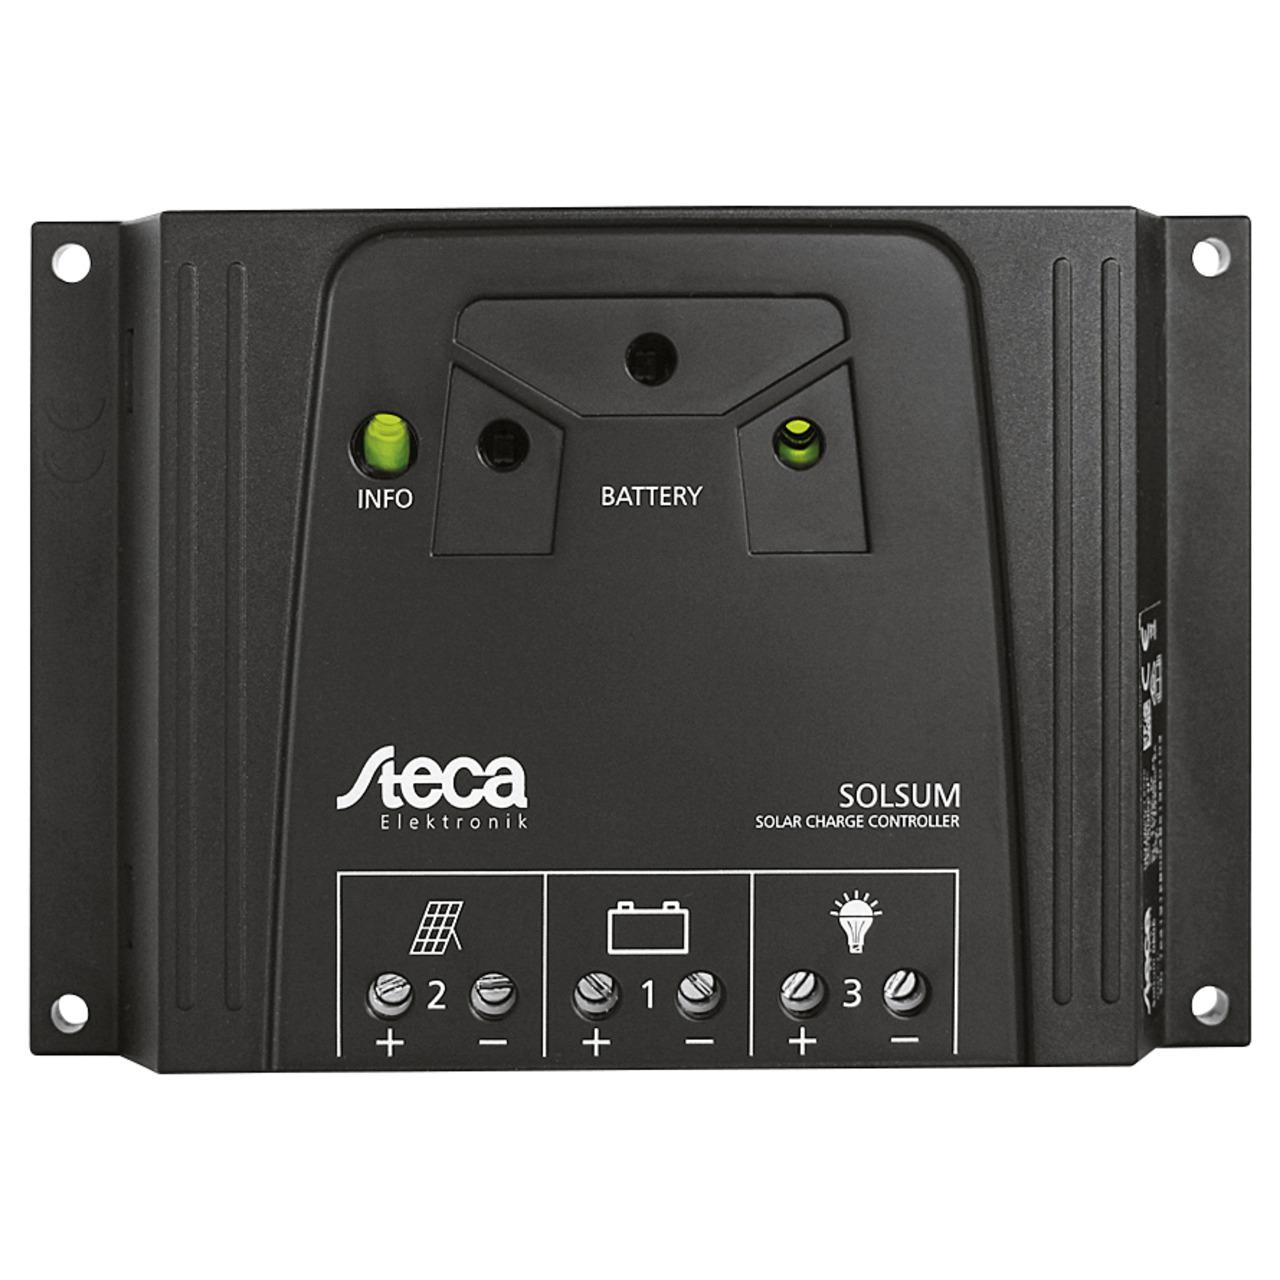 Steca Elektronik Solarladeregler 8-8F 12-24V- 8A- LED-Anzeige